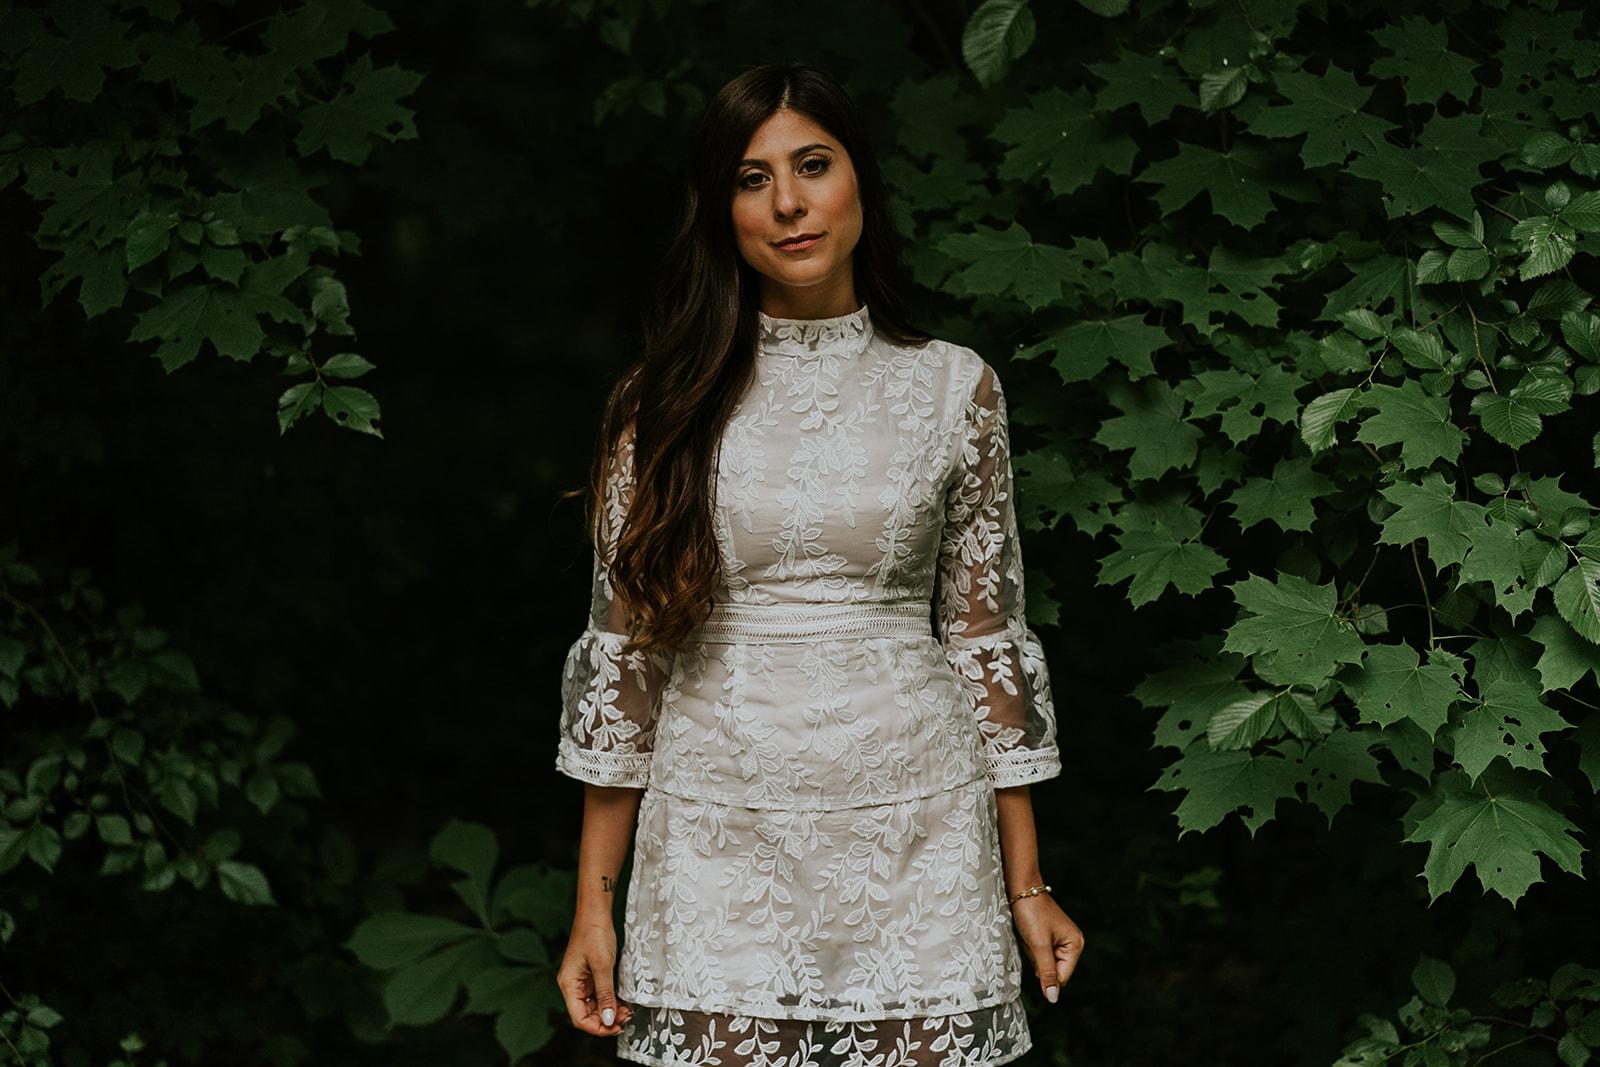 Sabri-photographe-sayde-_-george-wedding-341.jpg